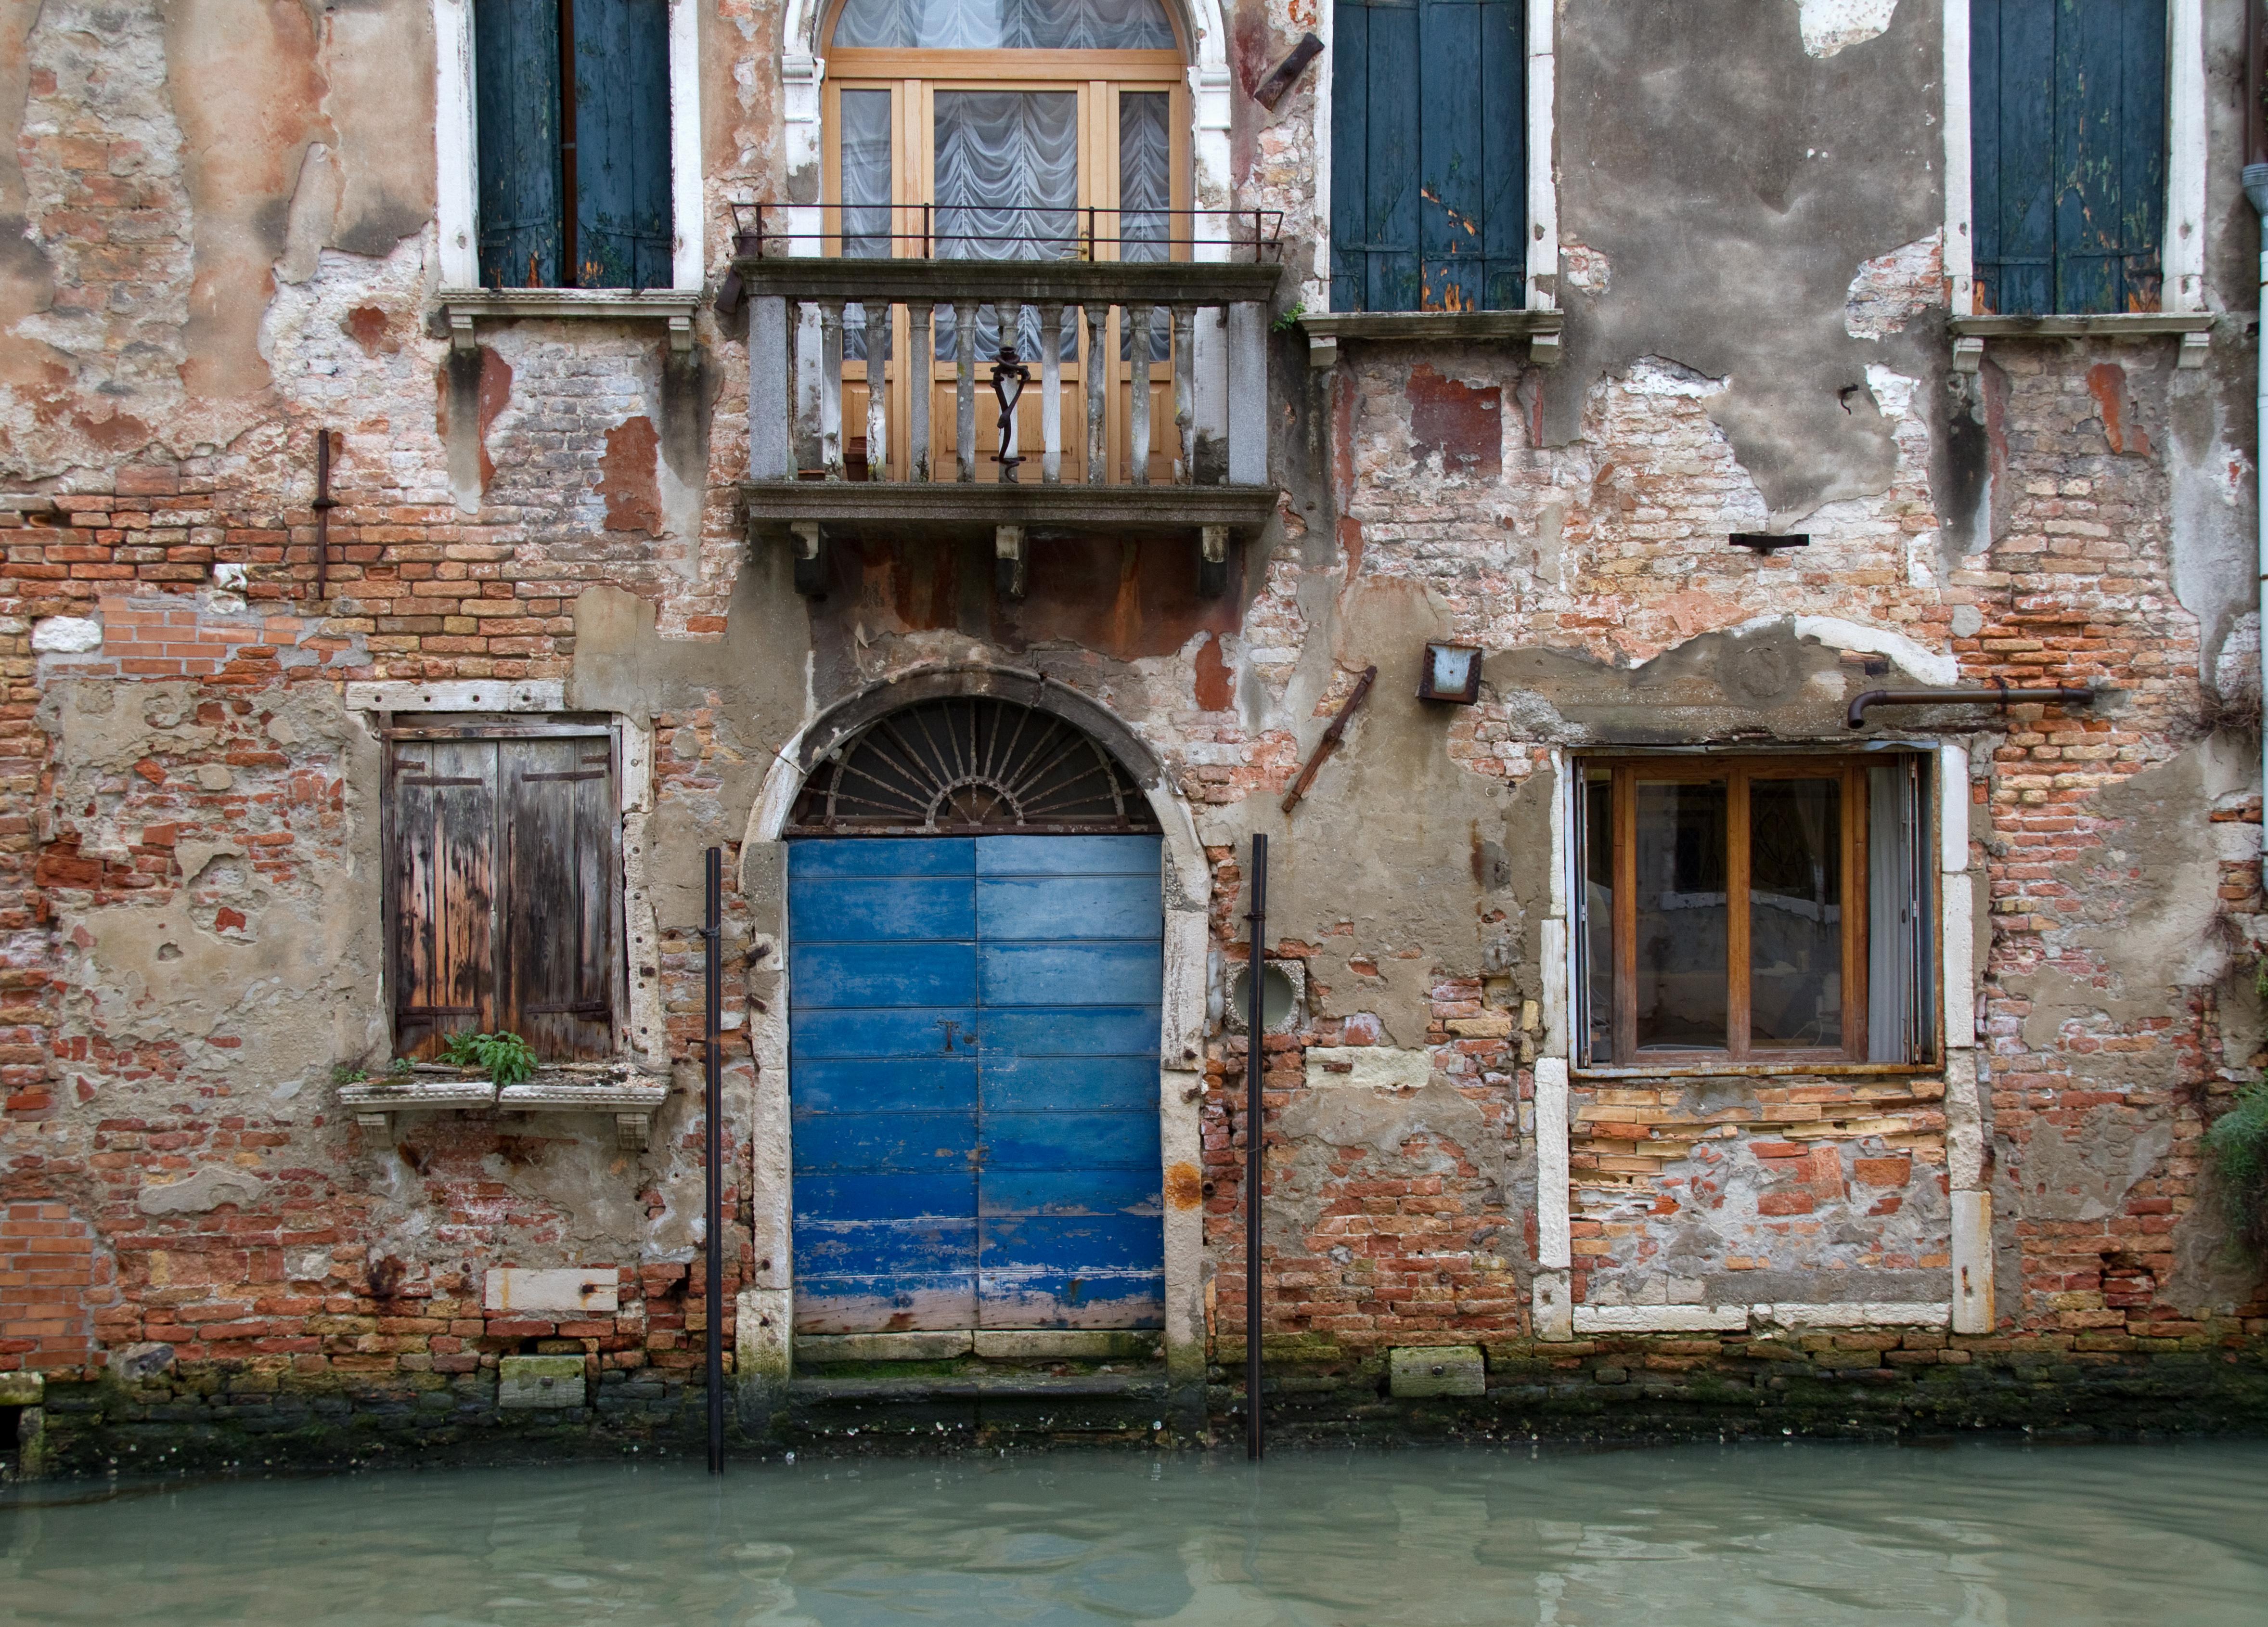 File:Venice Blue Door (7248139900).jpg - Wikimedia Commons